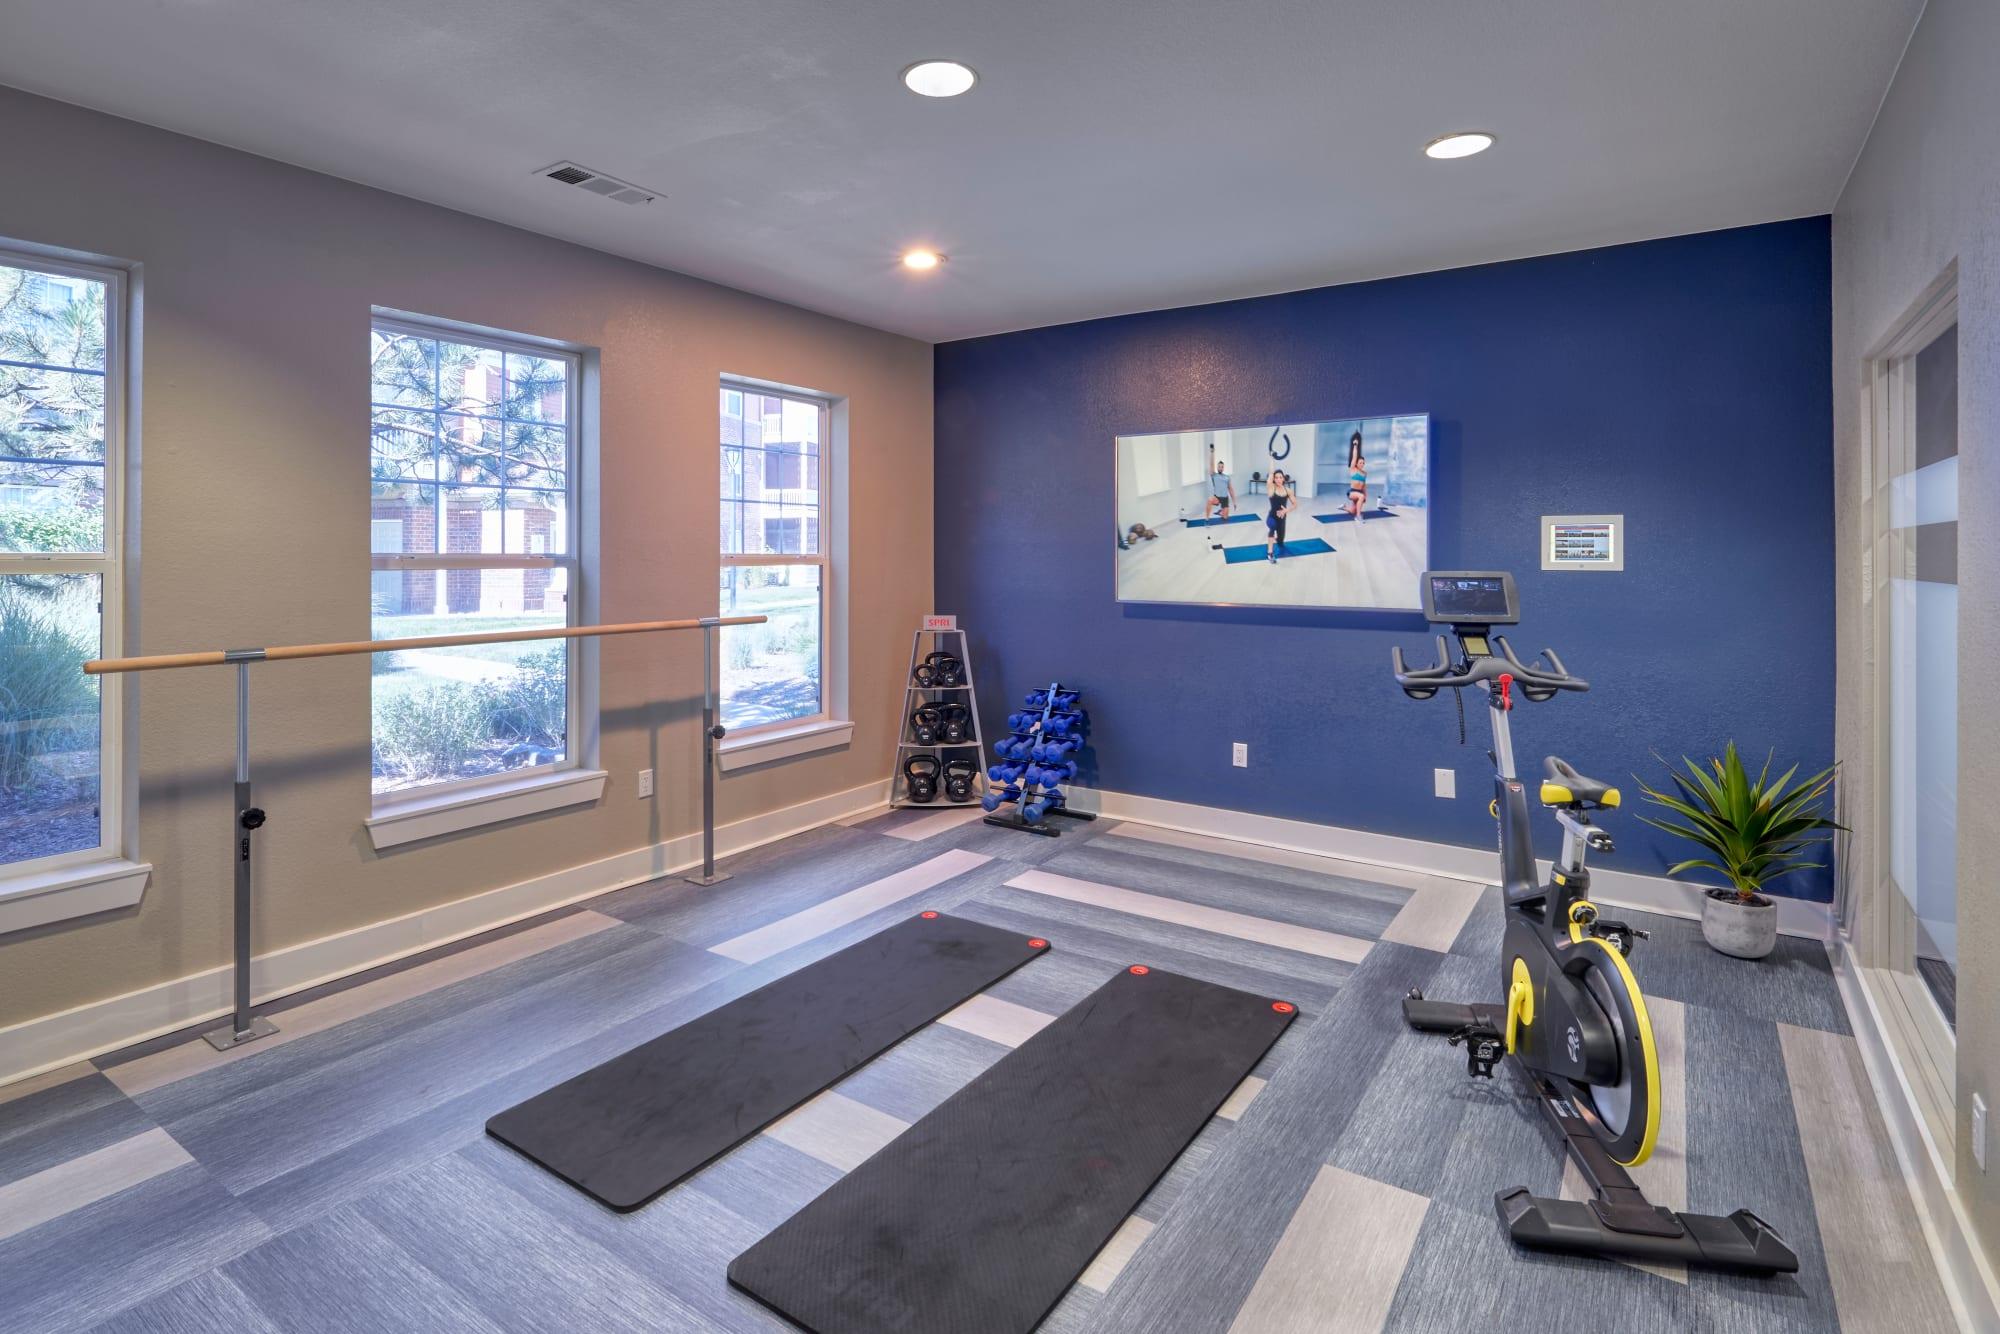 Fitness on demand room at Bear Valley Park in Denver, Colorado